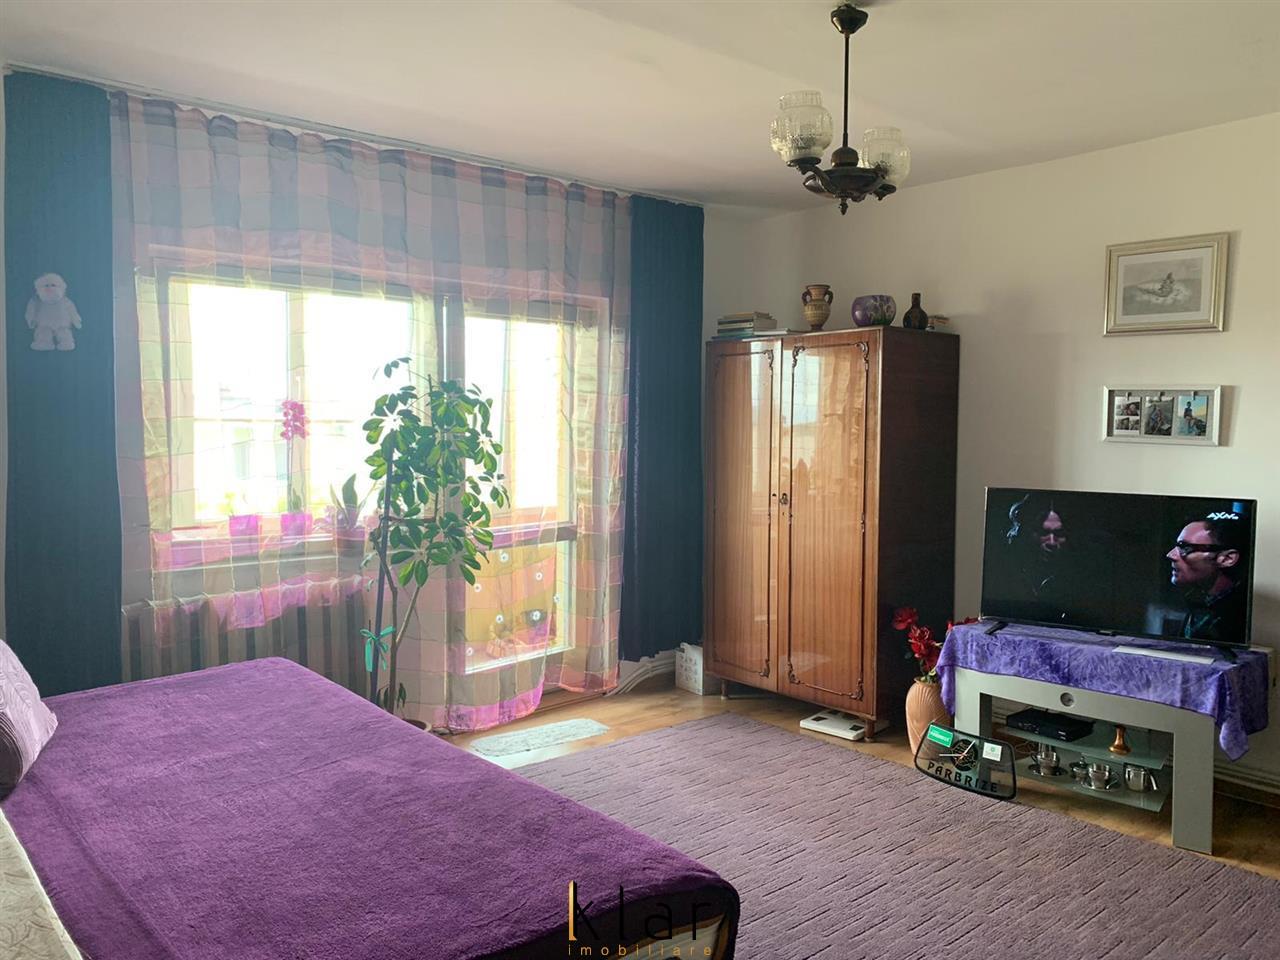 De vanzare apartament cu 3 camere in Zorilor